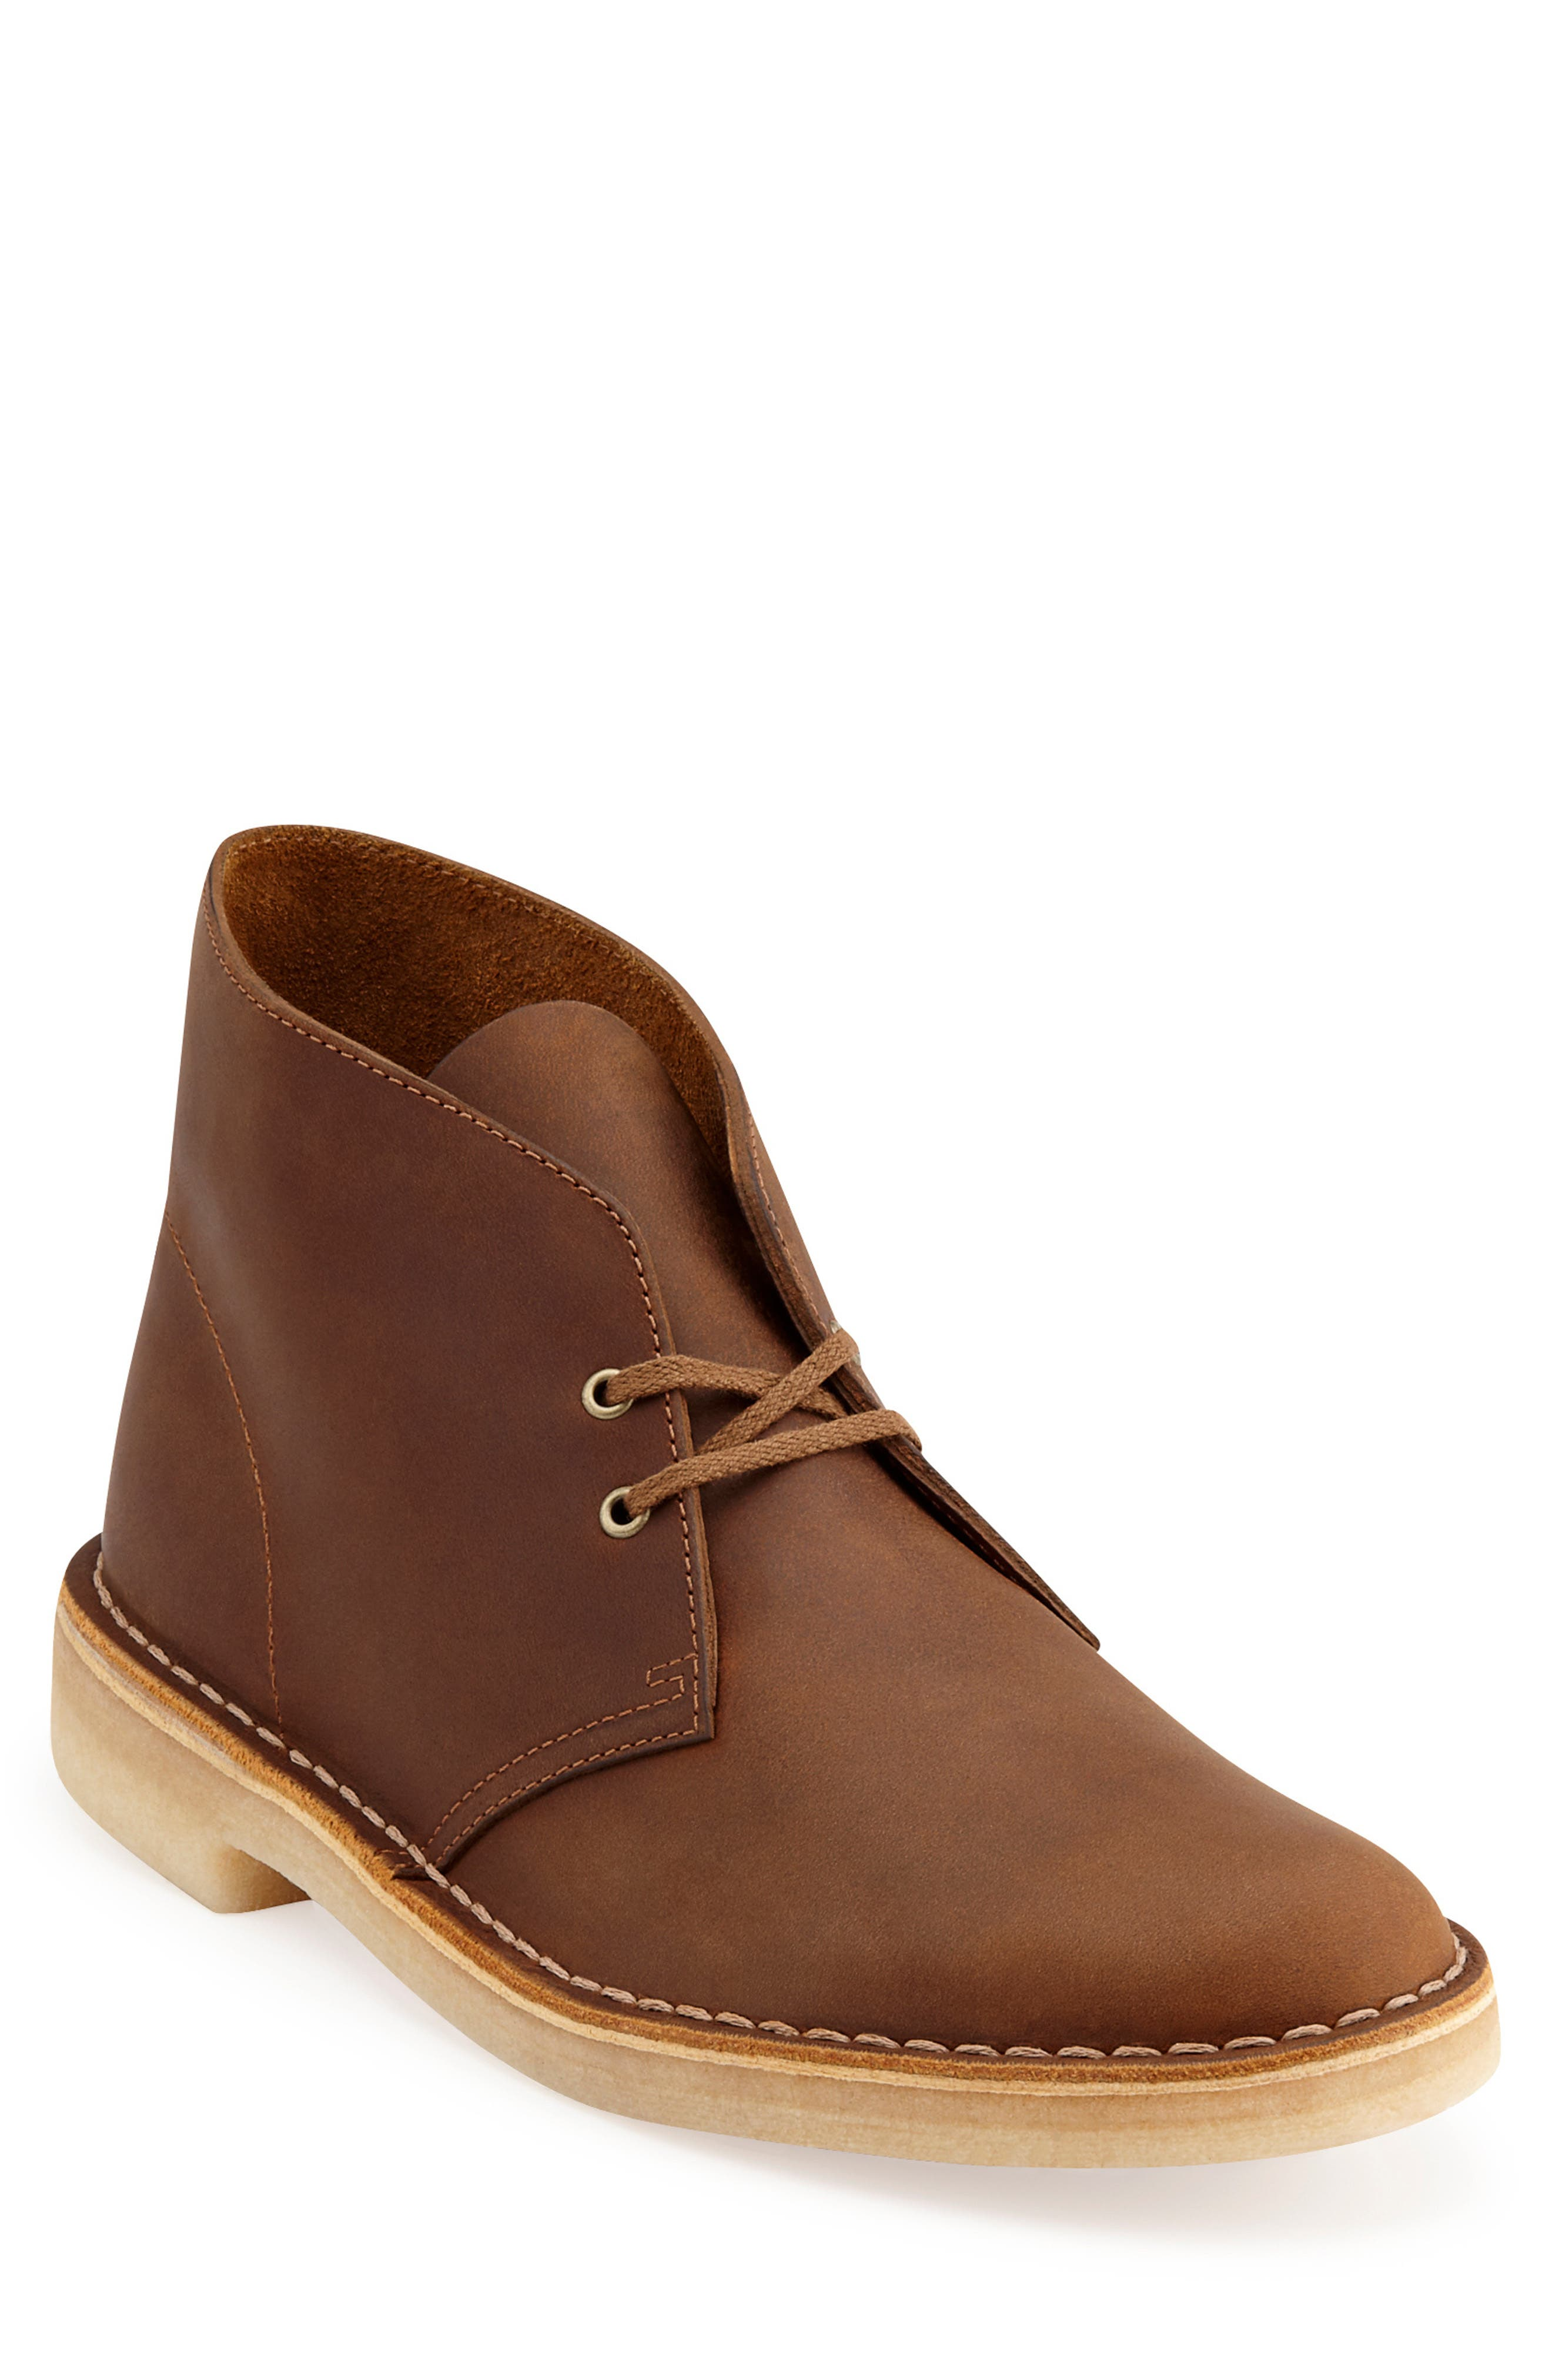 60s Mens Shoes | 70s Mens shoes – Platforms, Boots Mens Clarks Originals Desert Boot $69.99 AT vintagedancer.com